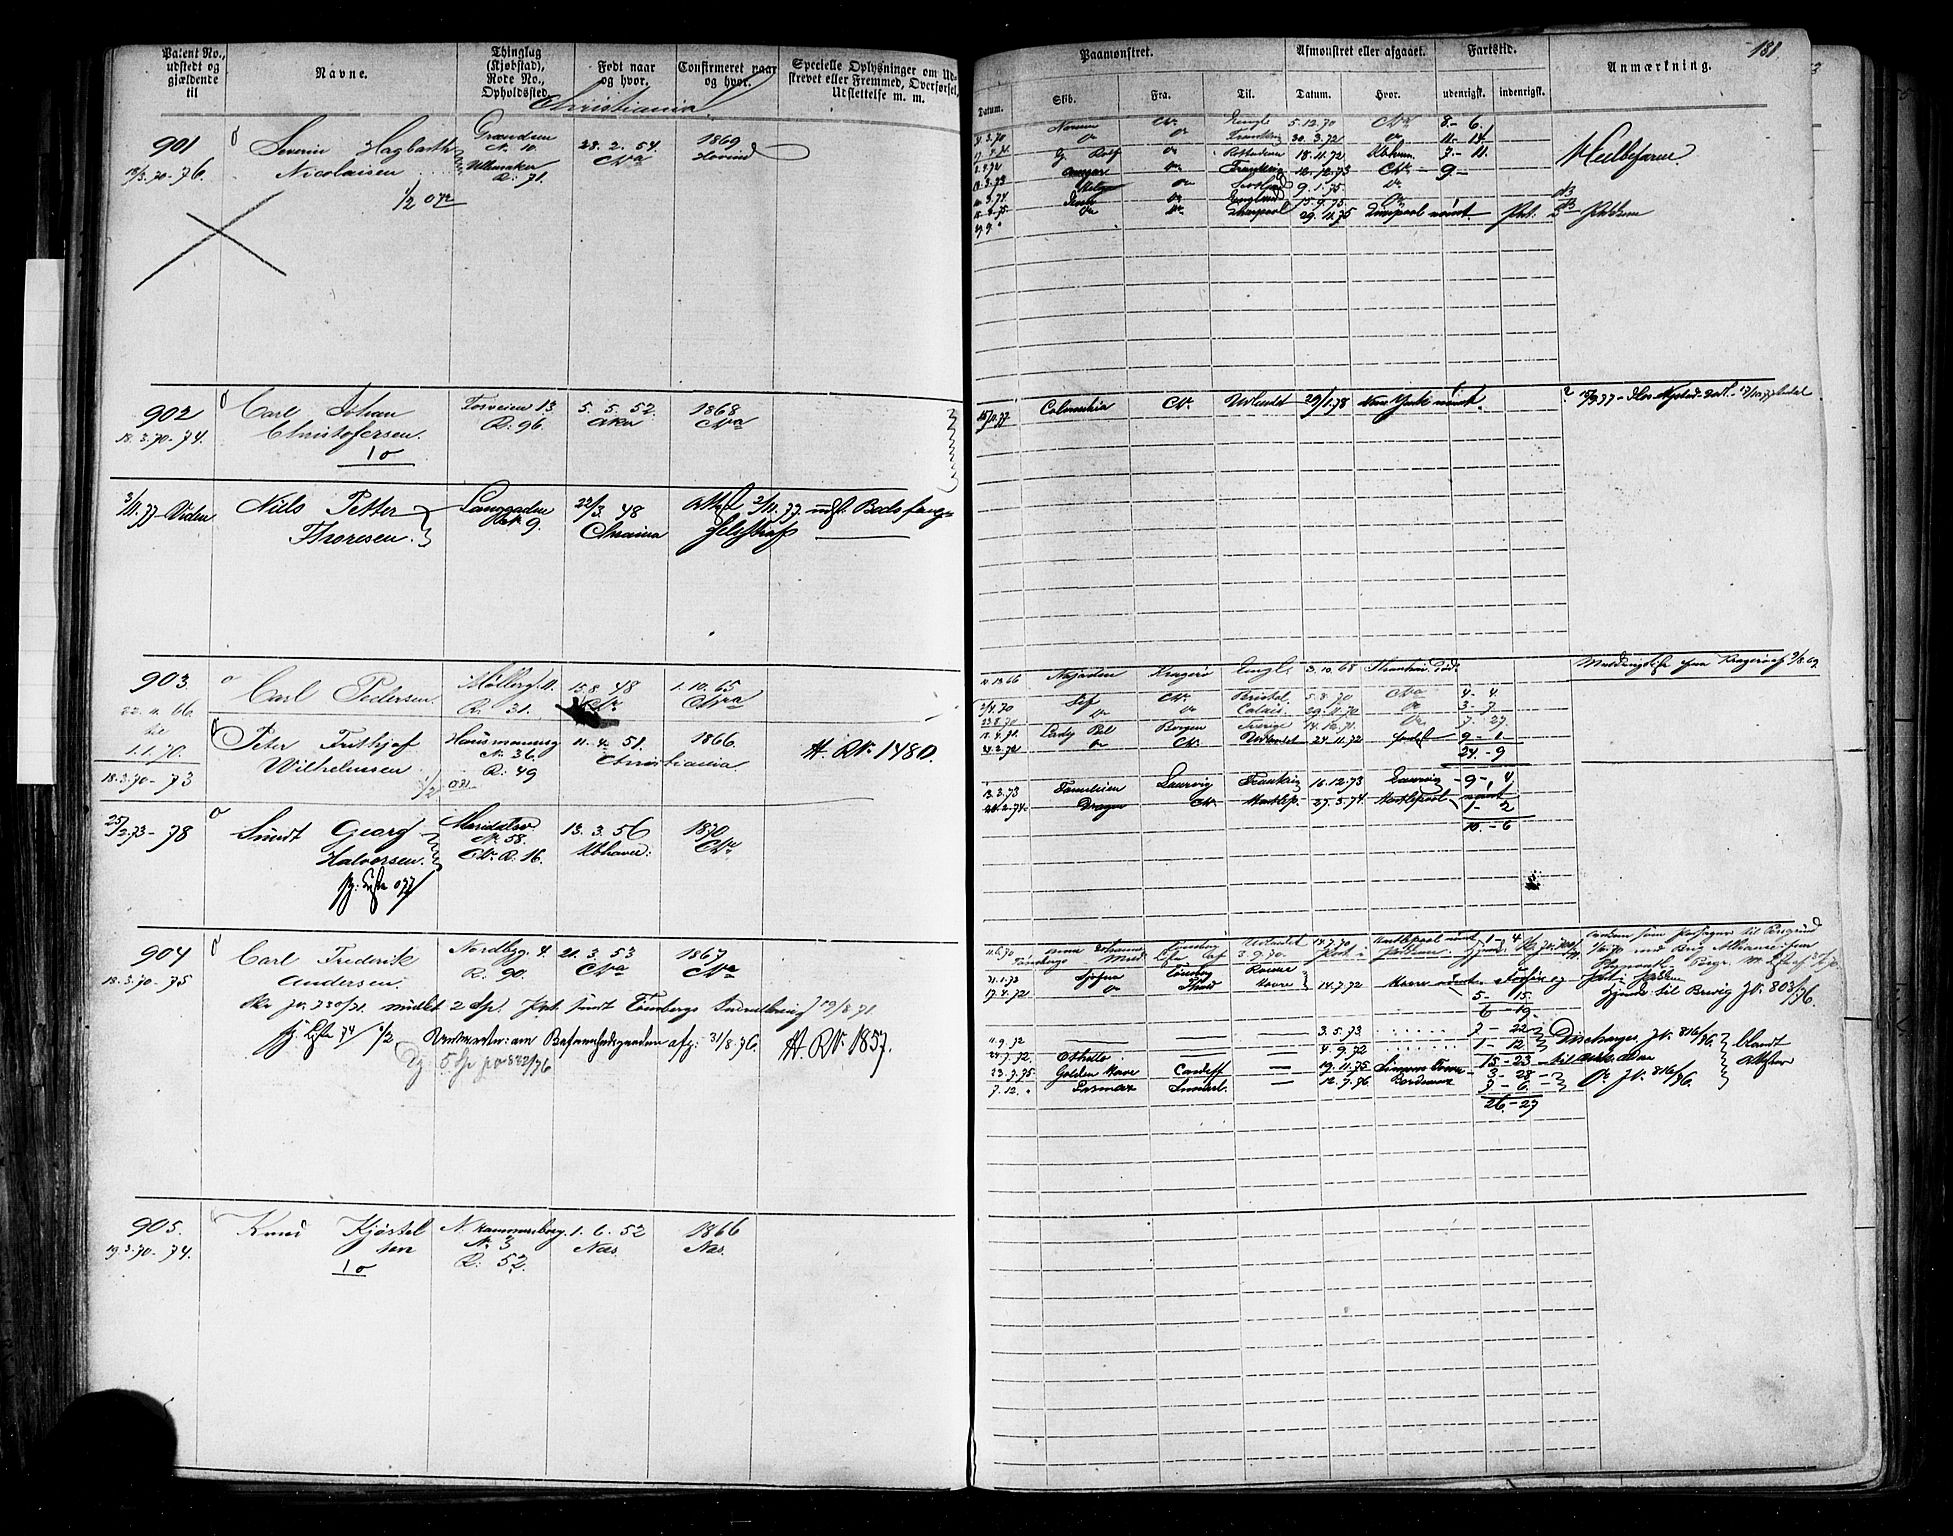 SAO, Oslo mønstringskontor, F/Fc/Fca/L0001: Annotasjonsrulle, 1866-1881, s. 180b-181a